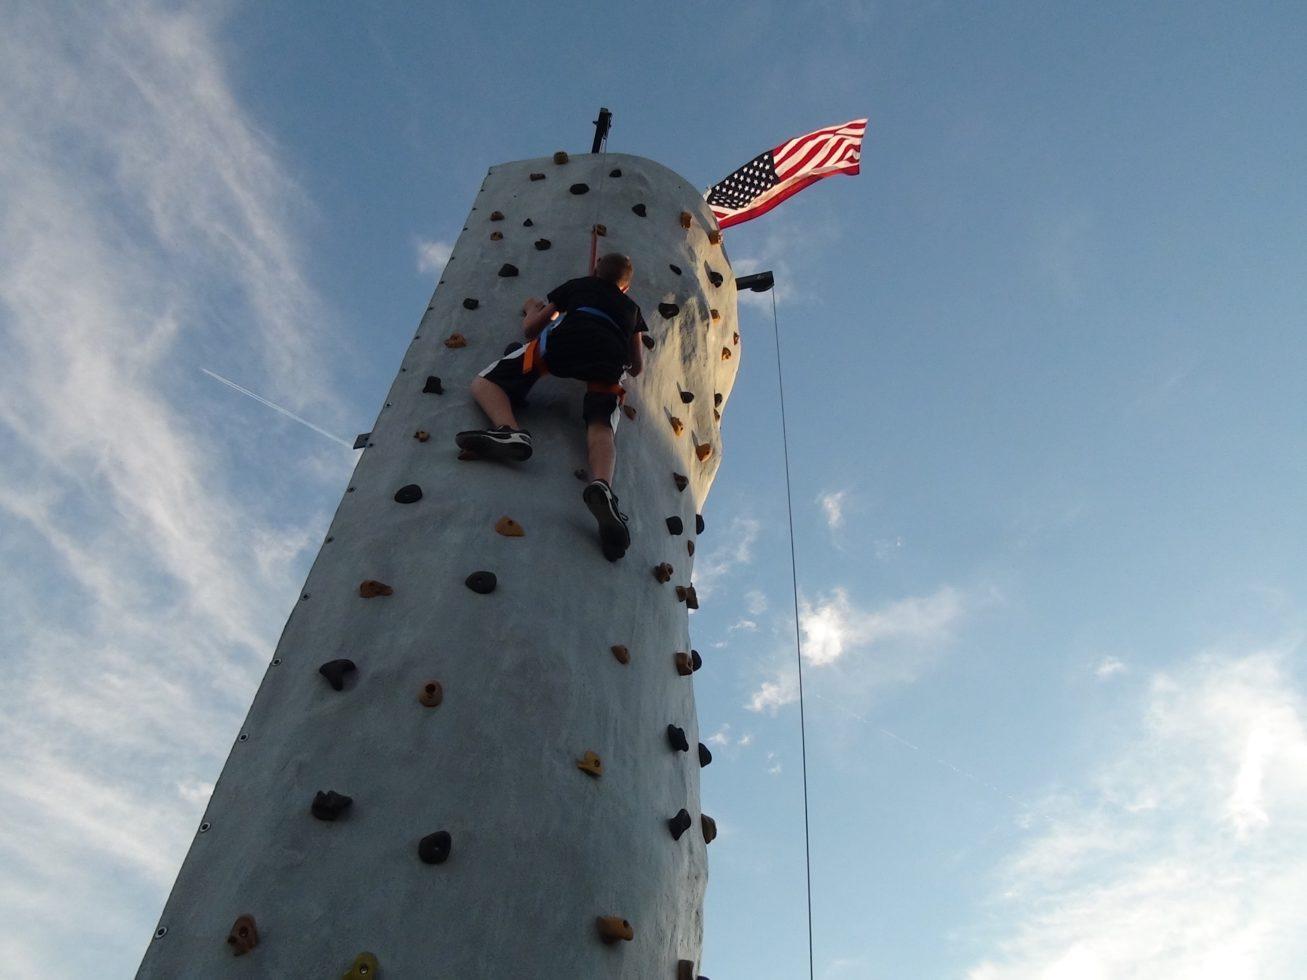 Kid Climbing rock wall